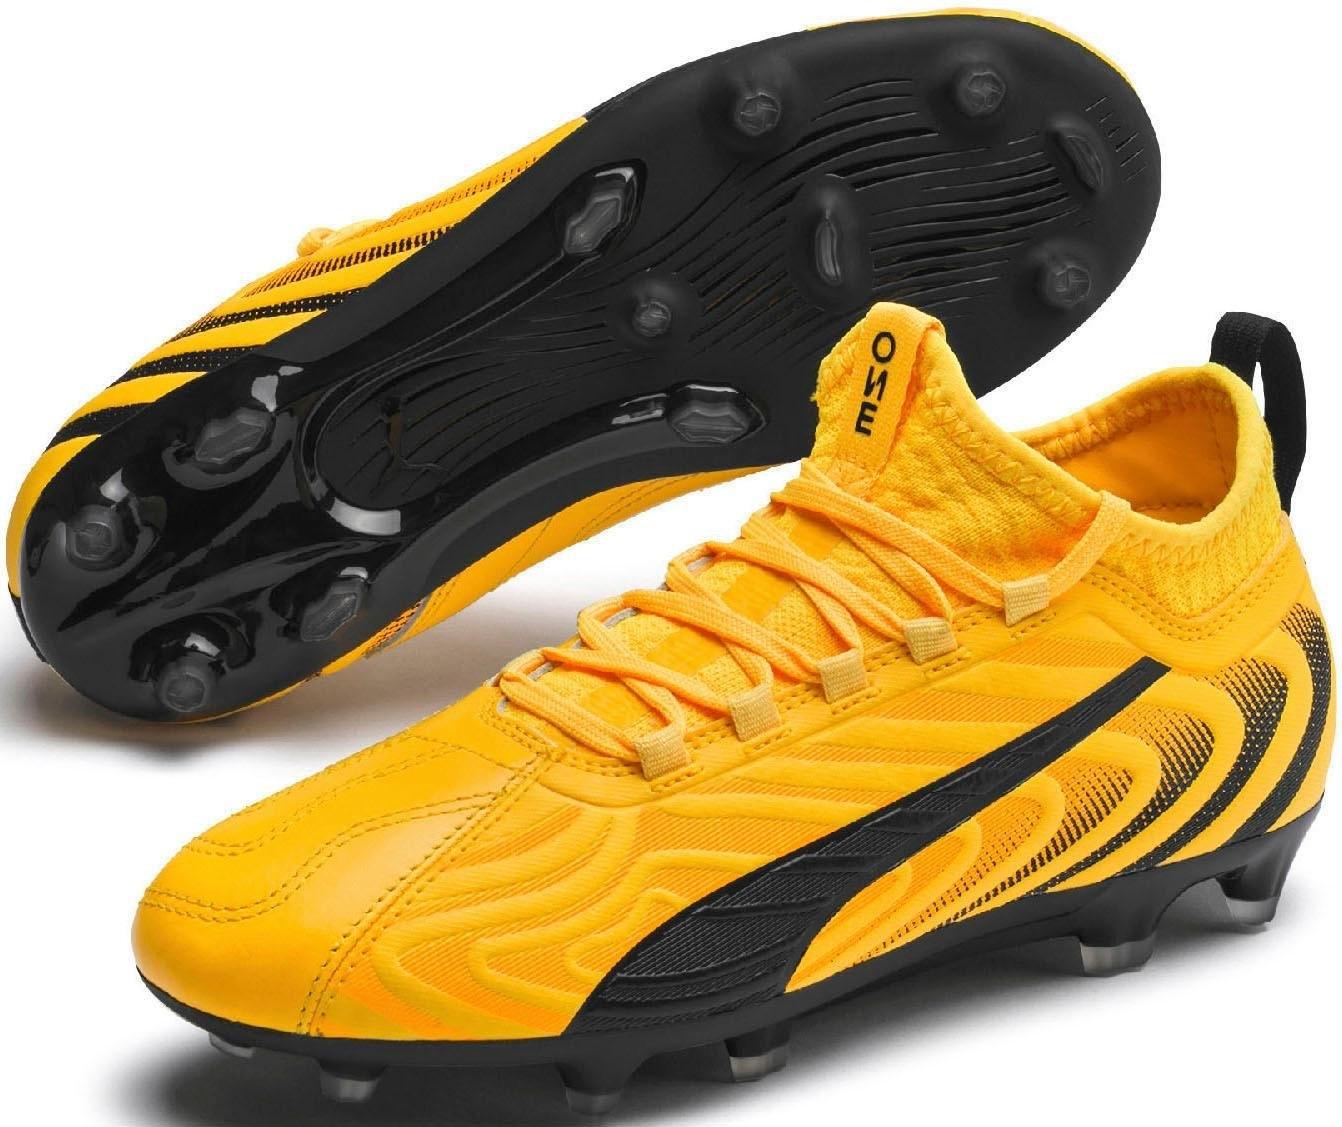 Puma voetbalschoenen »PUMA ONE 20.3 FG/AG Jr« goedkoop op otto.nl kopen